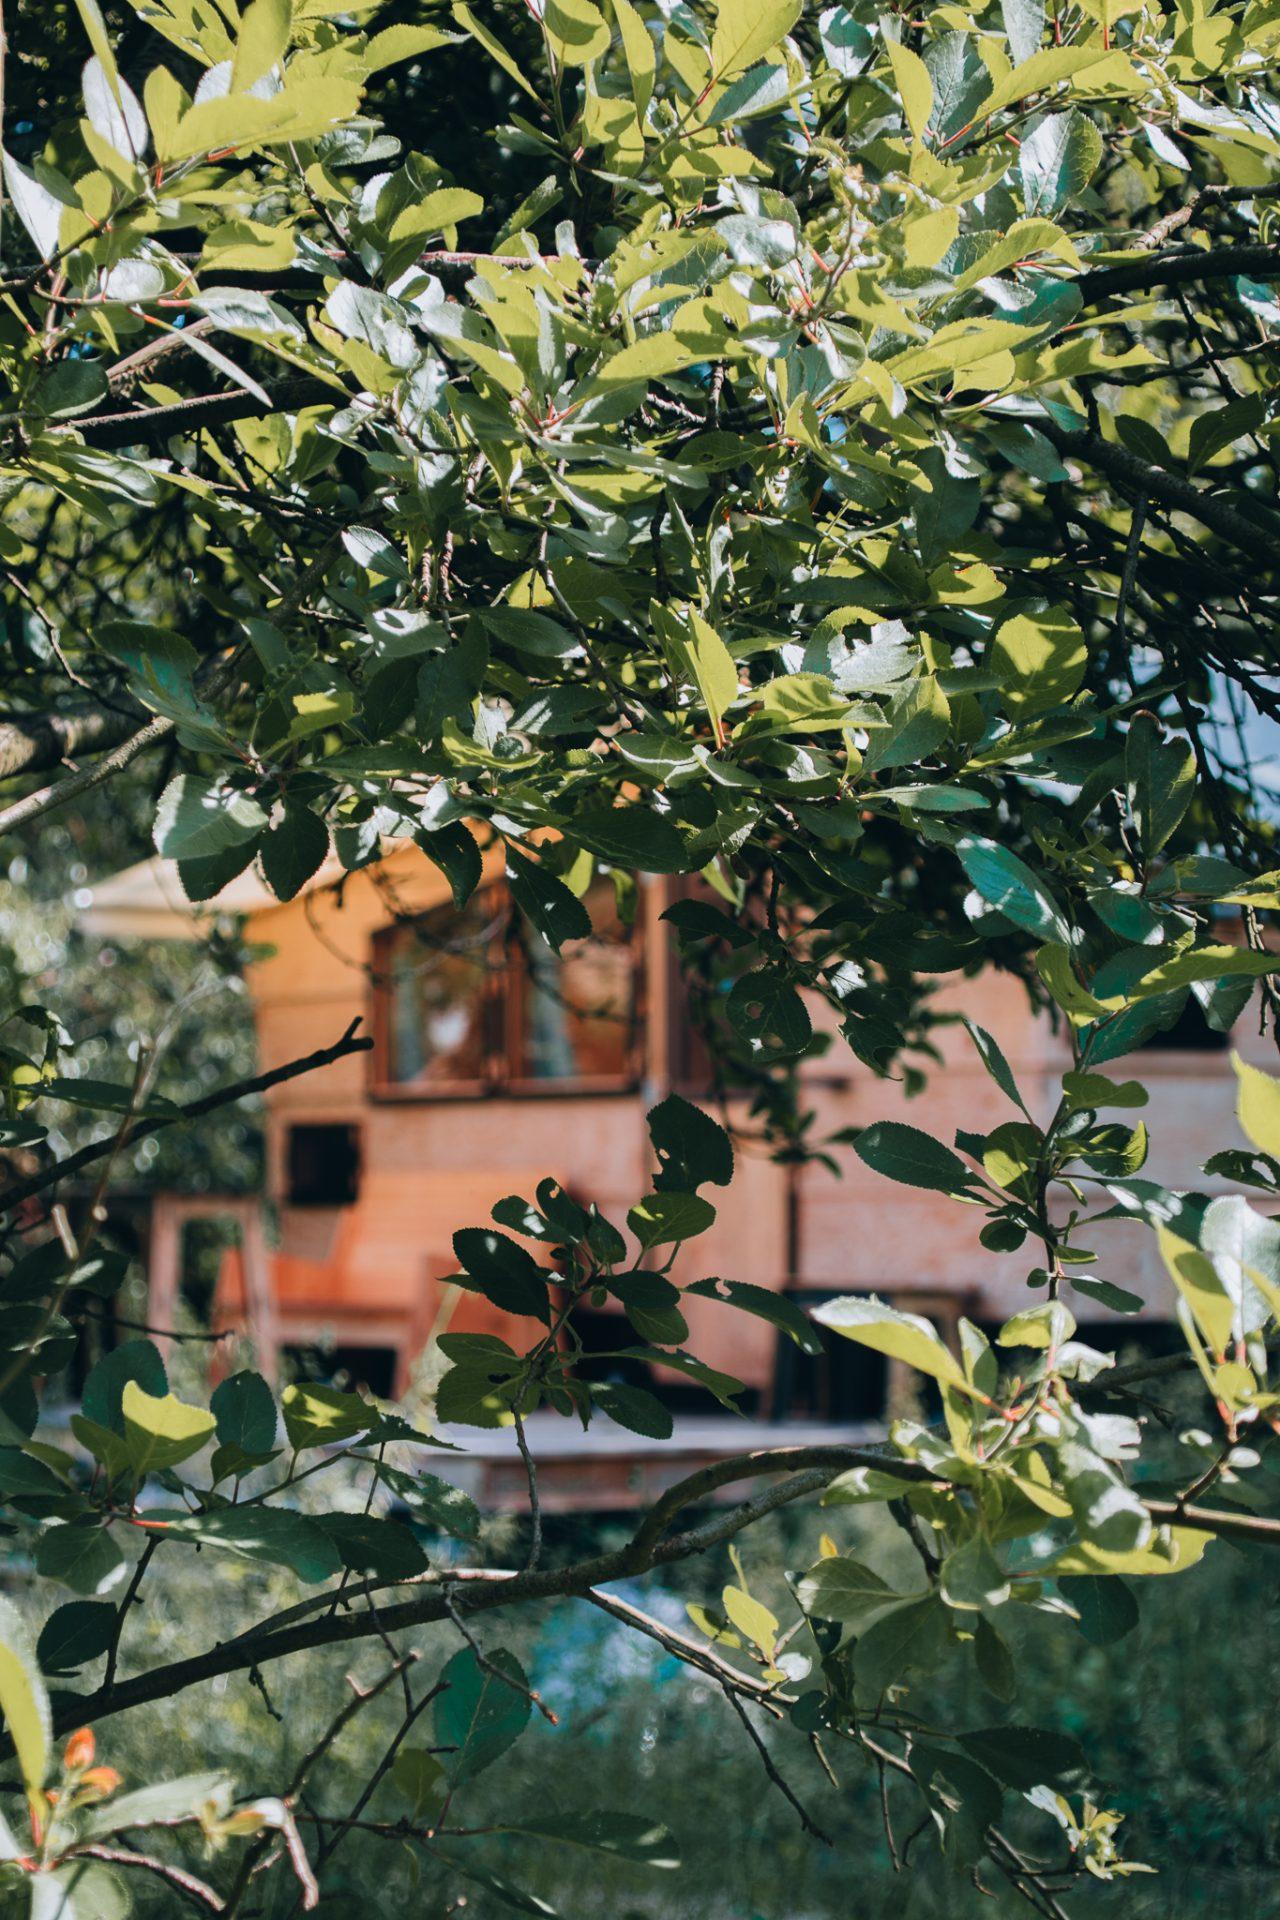 destinature-dorf-hütten-wendland-tiny-house-urlaub